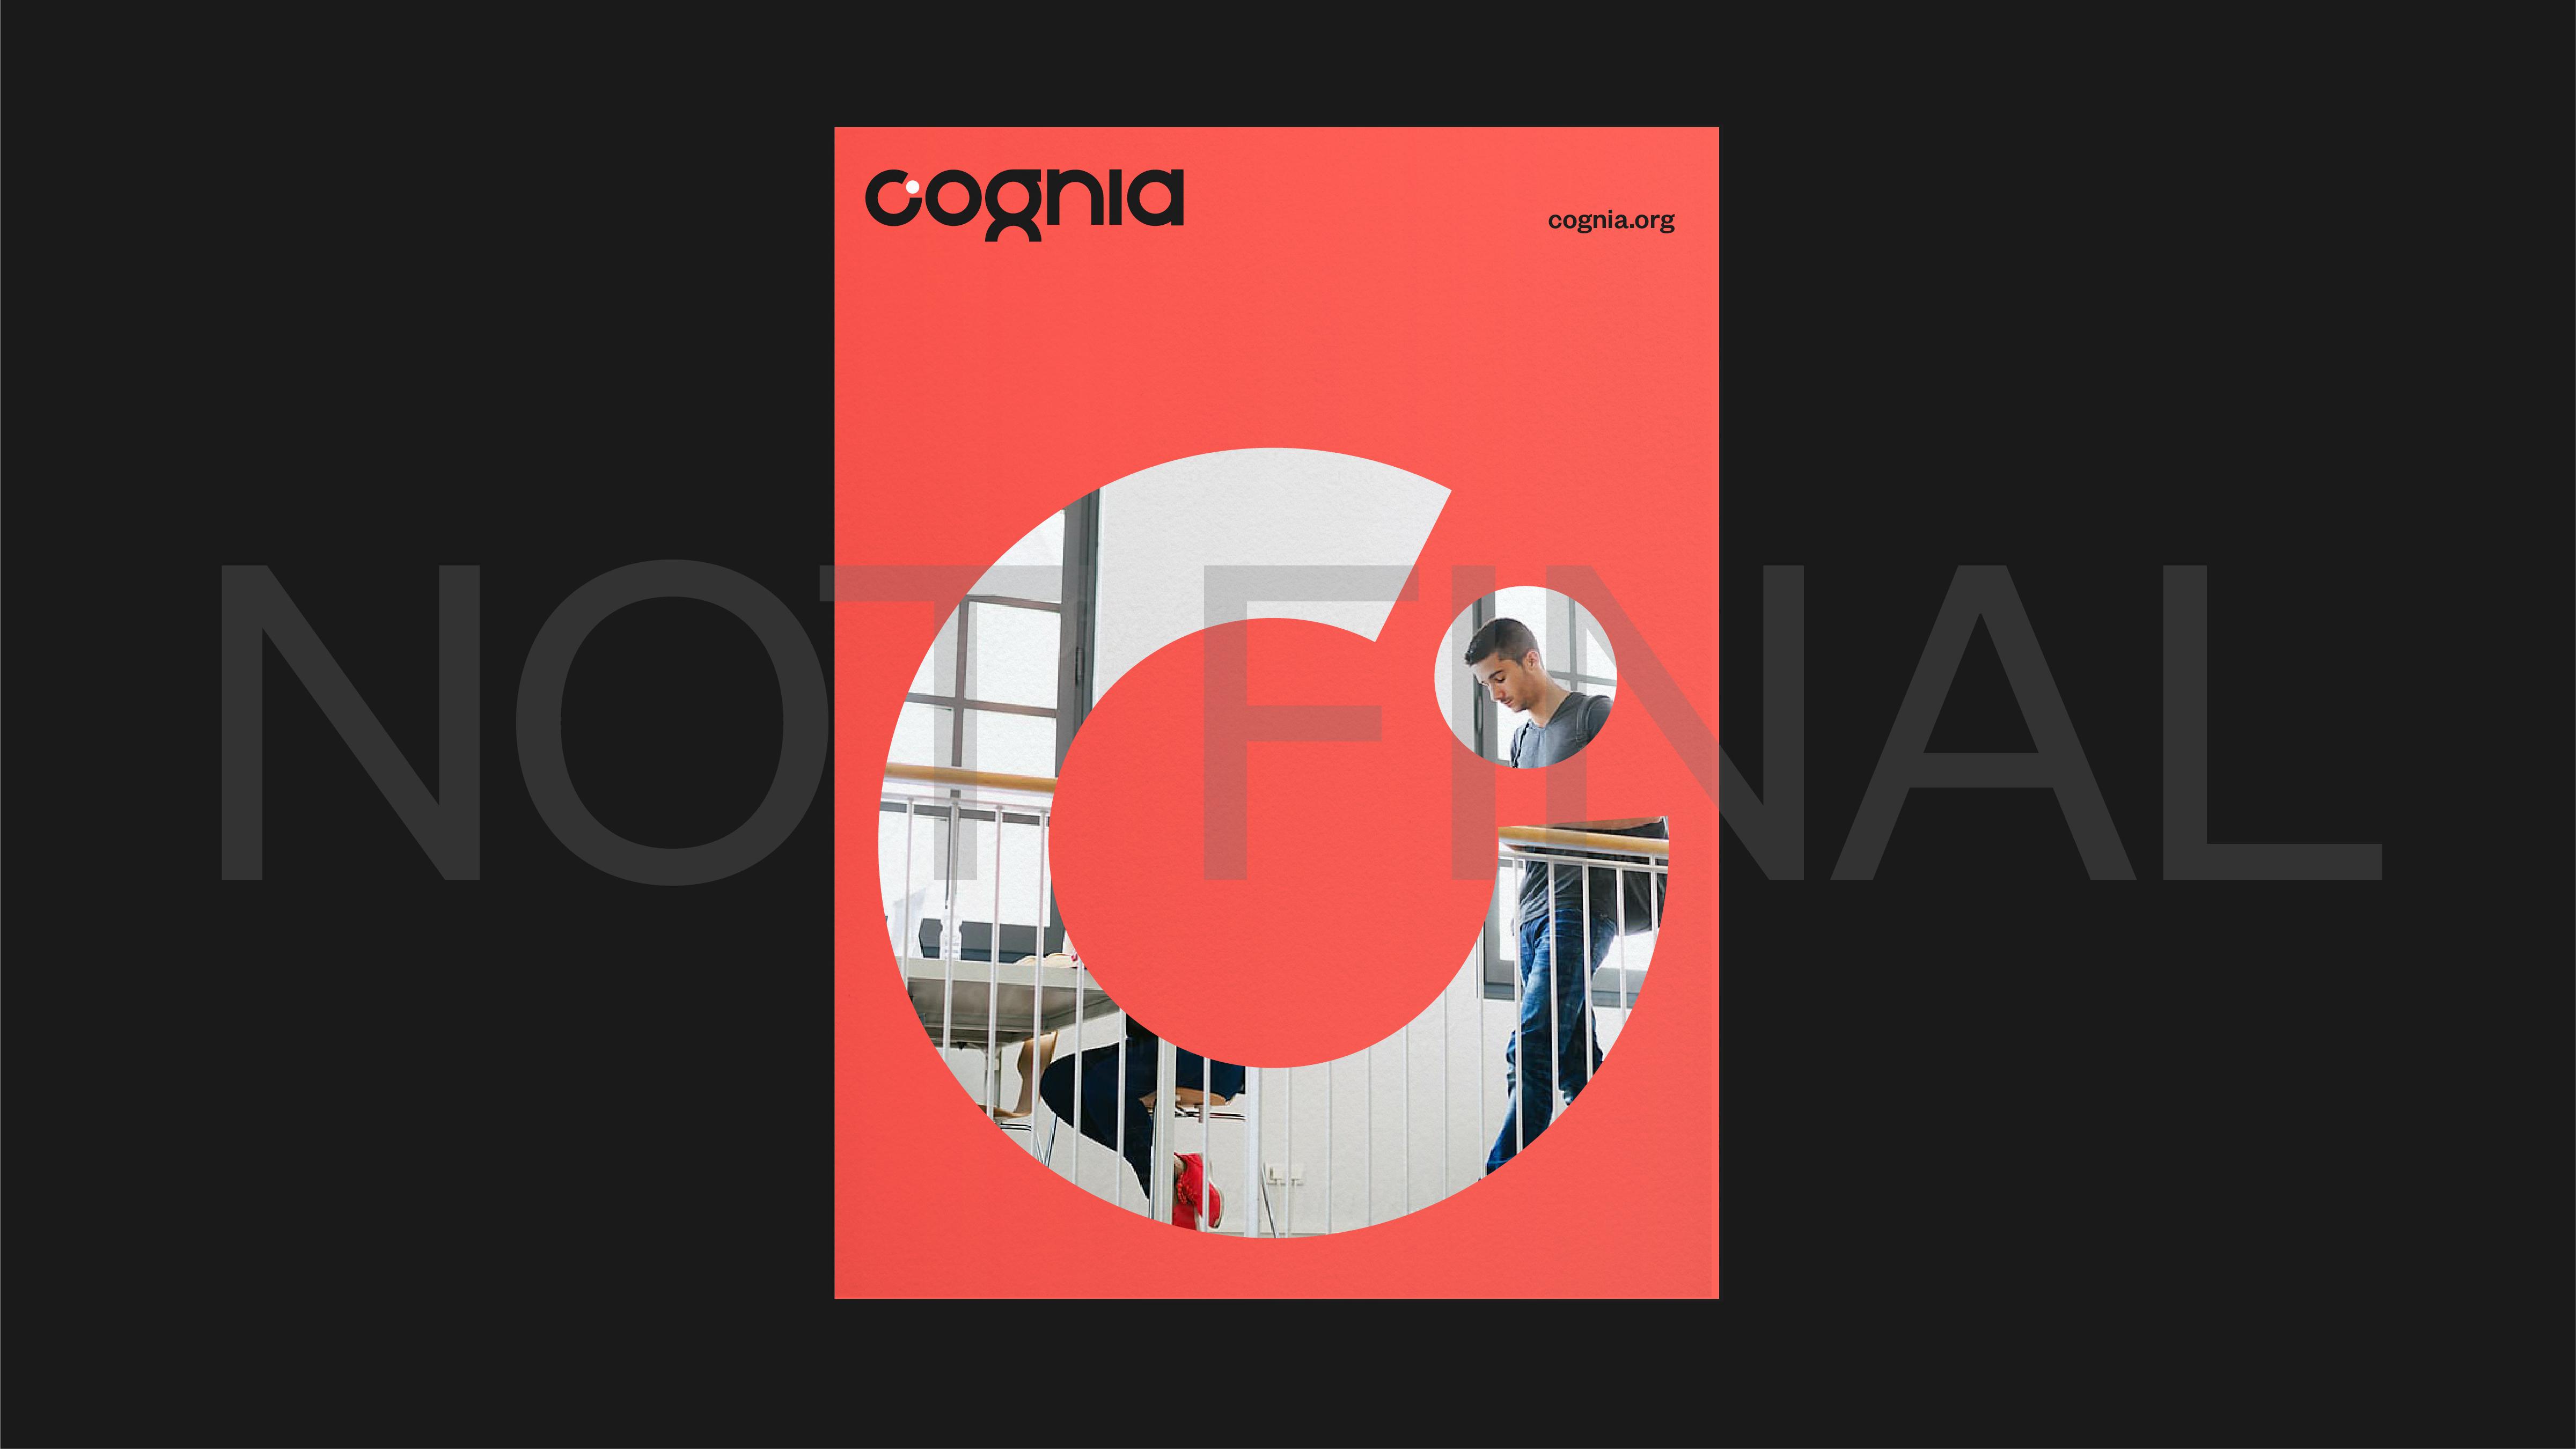 cognia_refinements-04